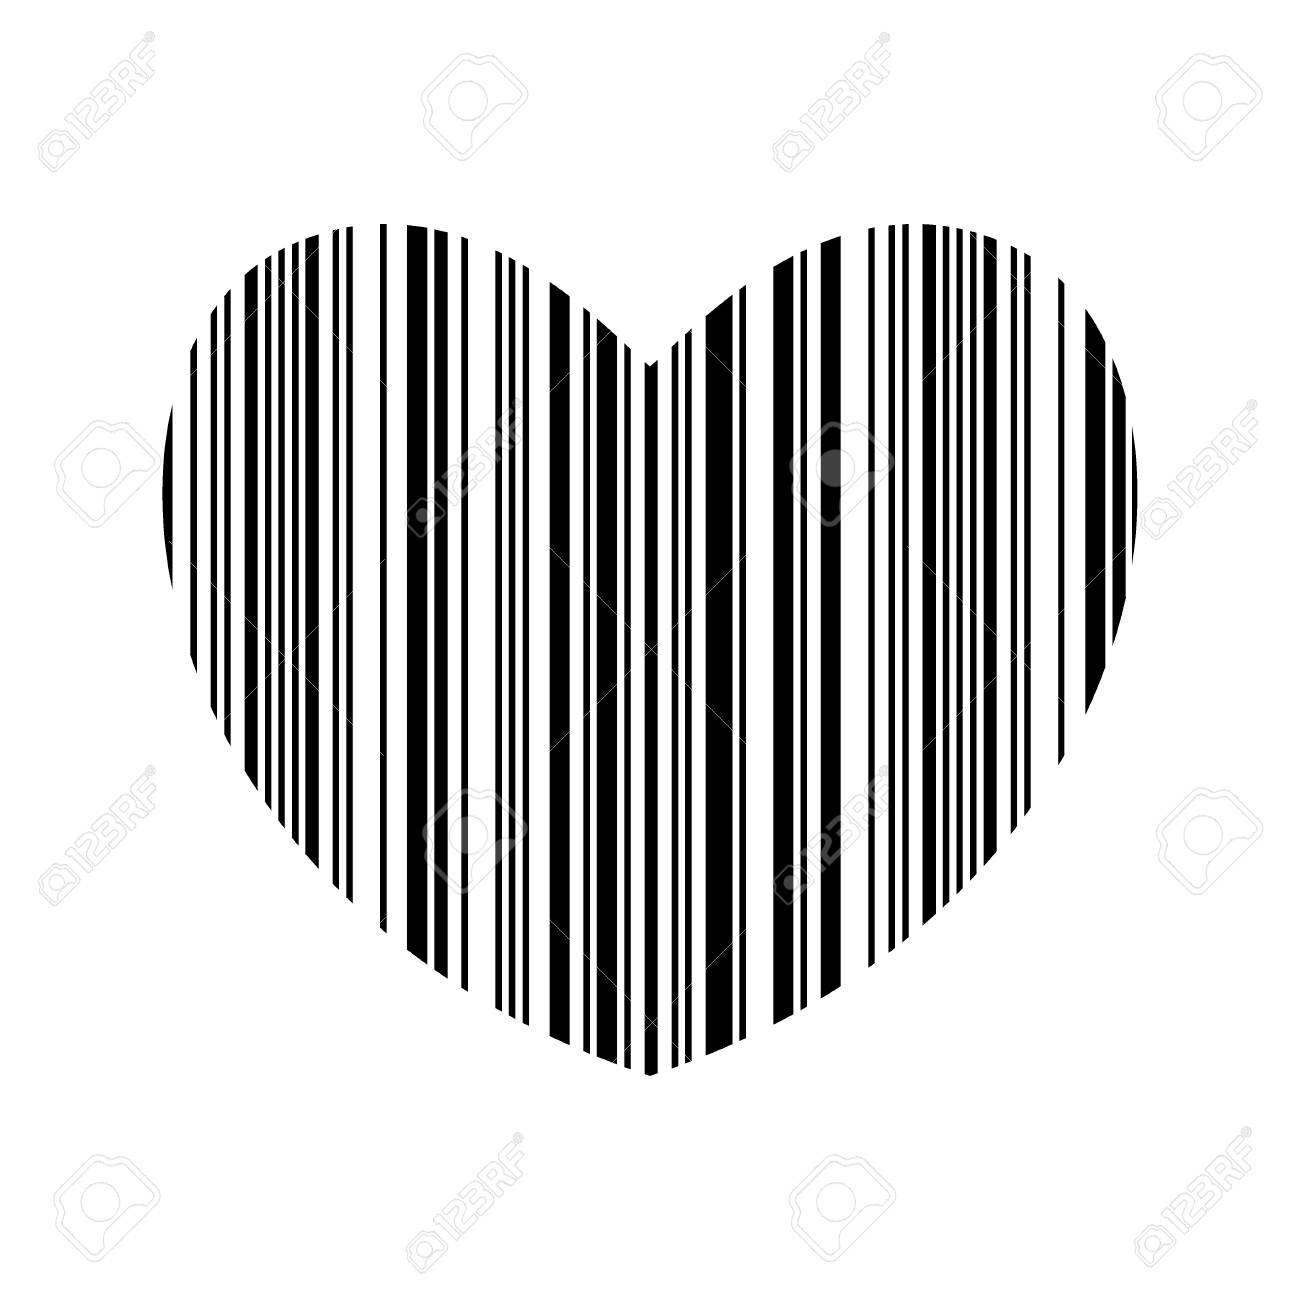 Heart text code  ❤️ Red Heart Emoji  2019-06-20